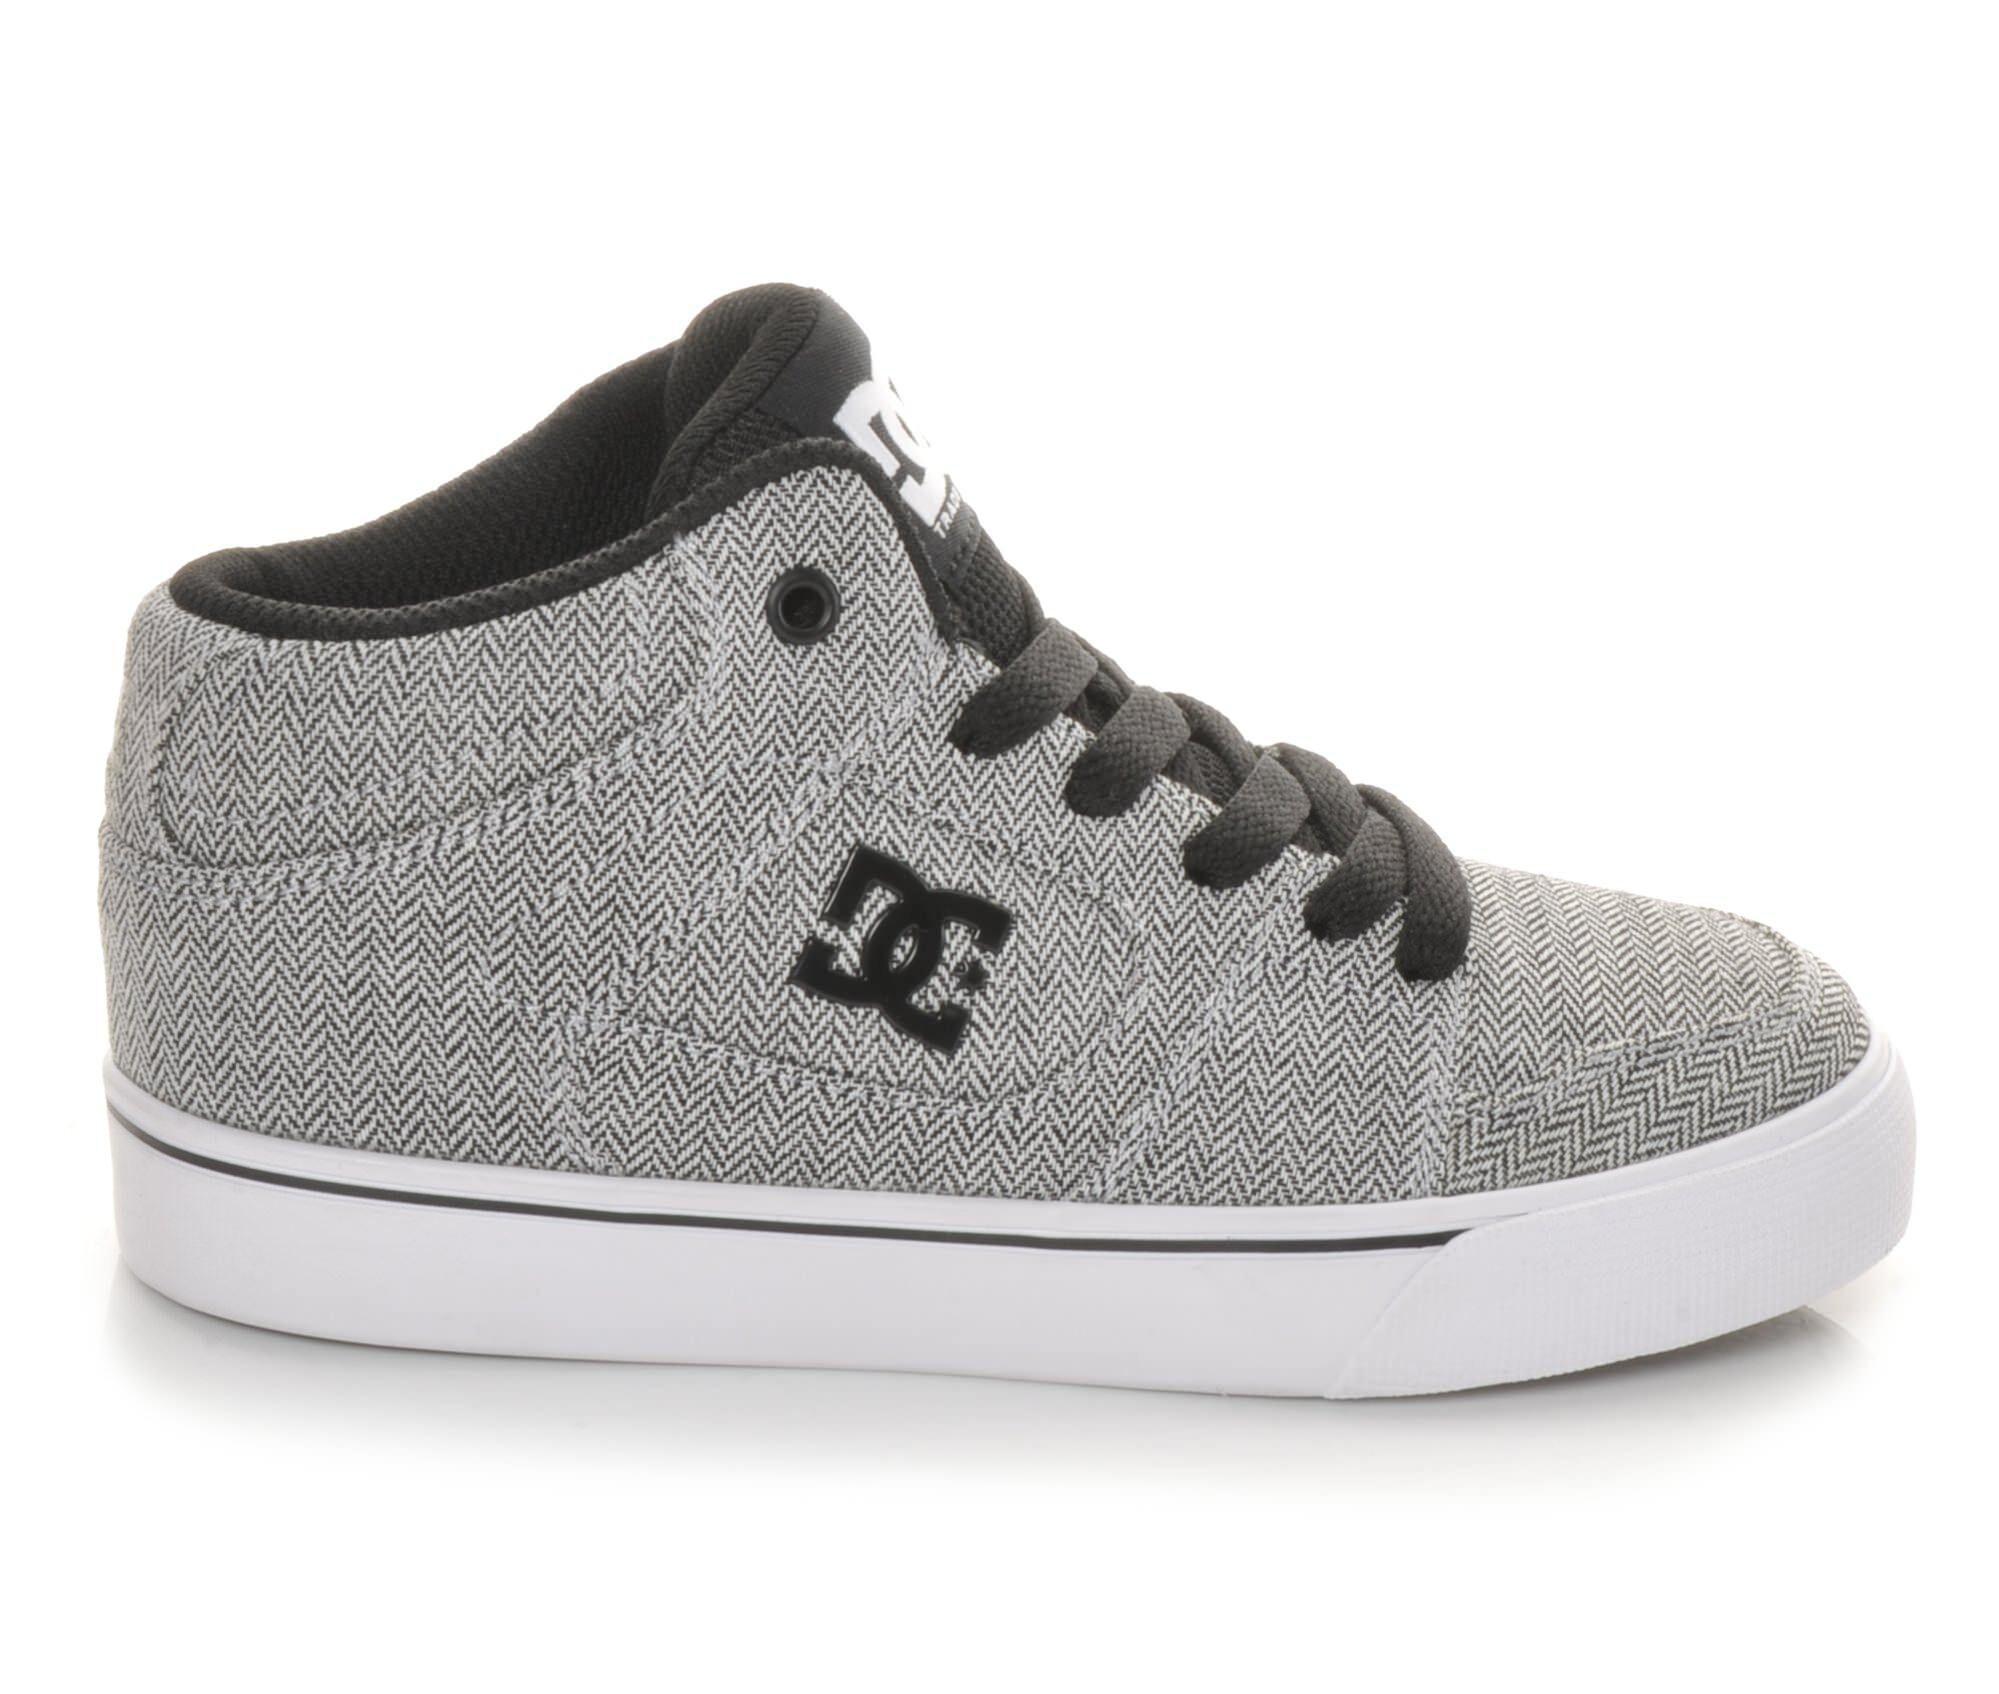 DC Shoes DC Patrol TX SE 10 5 3 Boys Casual Shoes Black/White